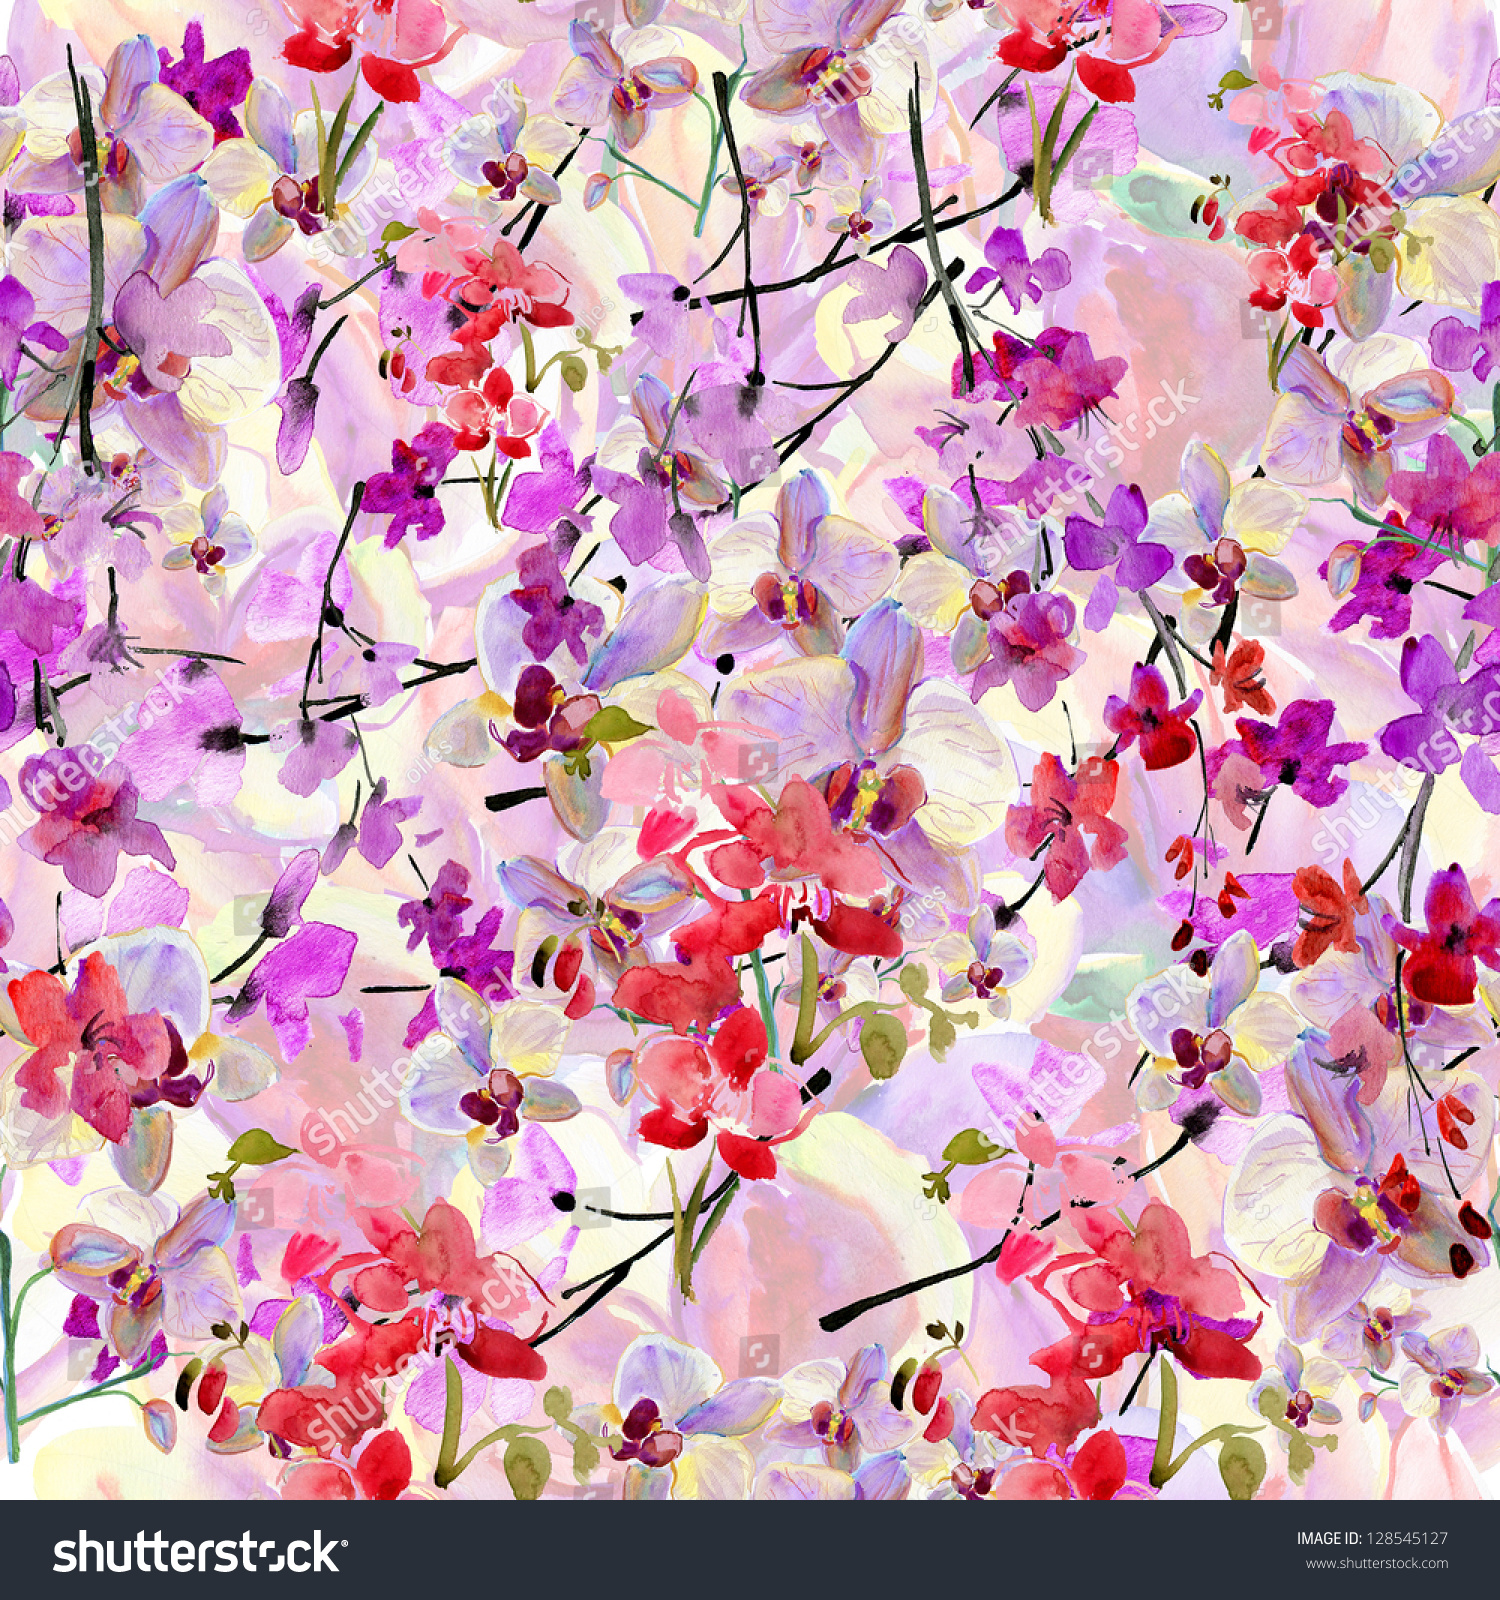 Abstract Watercolor Desktop Wallpaper